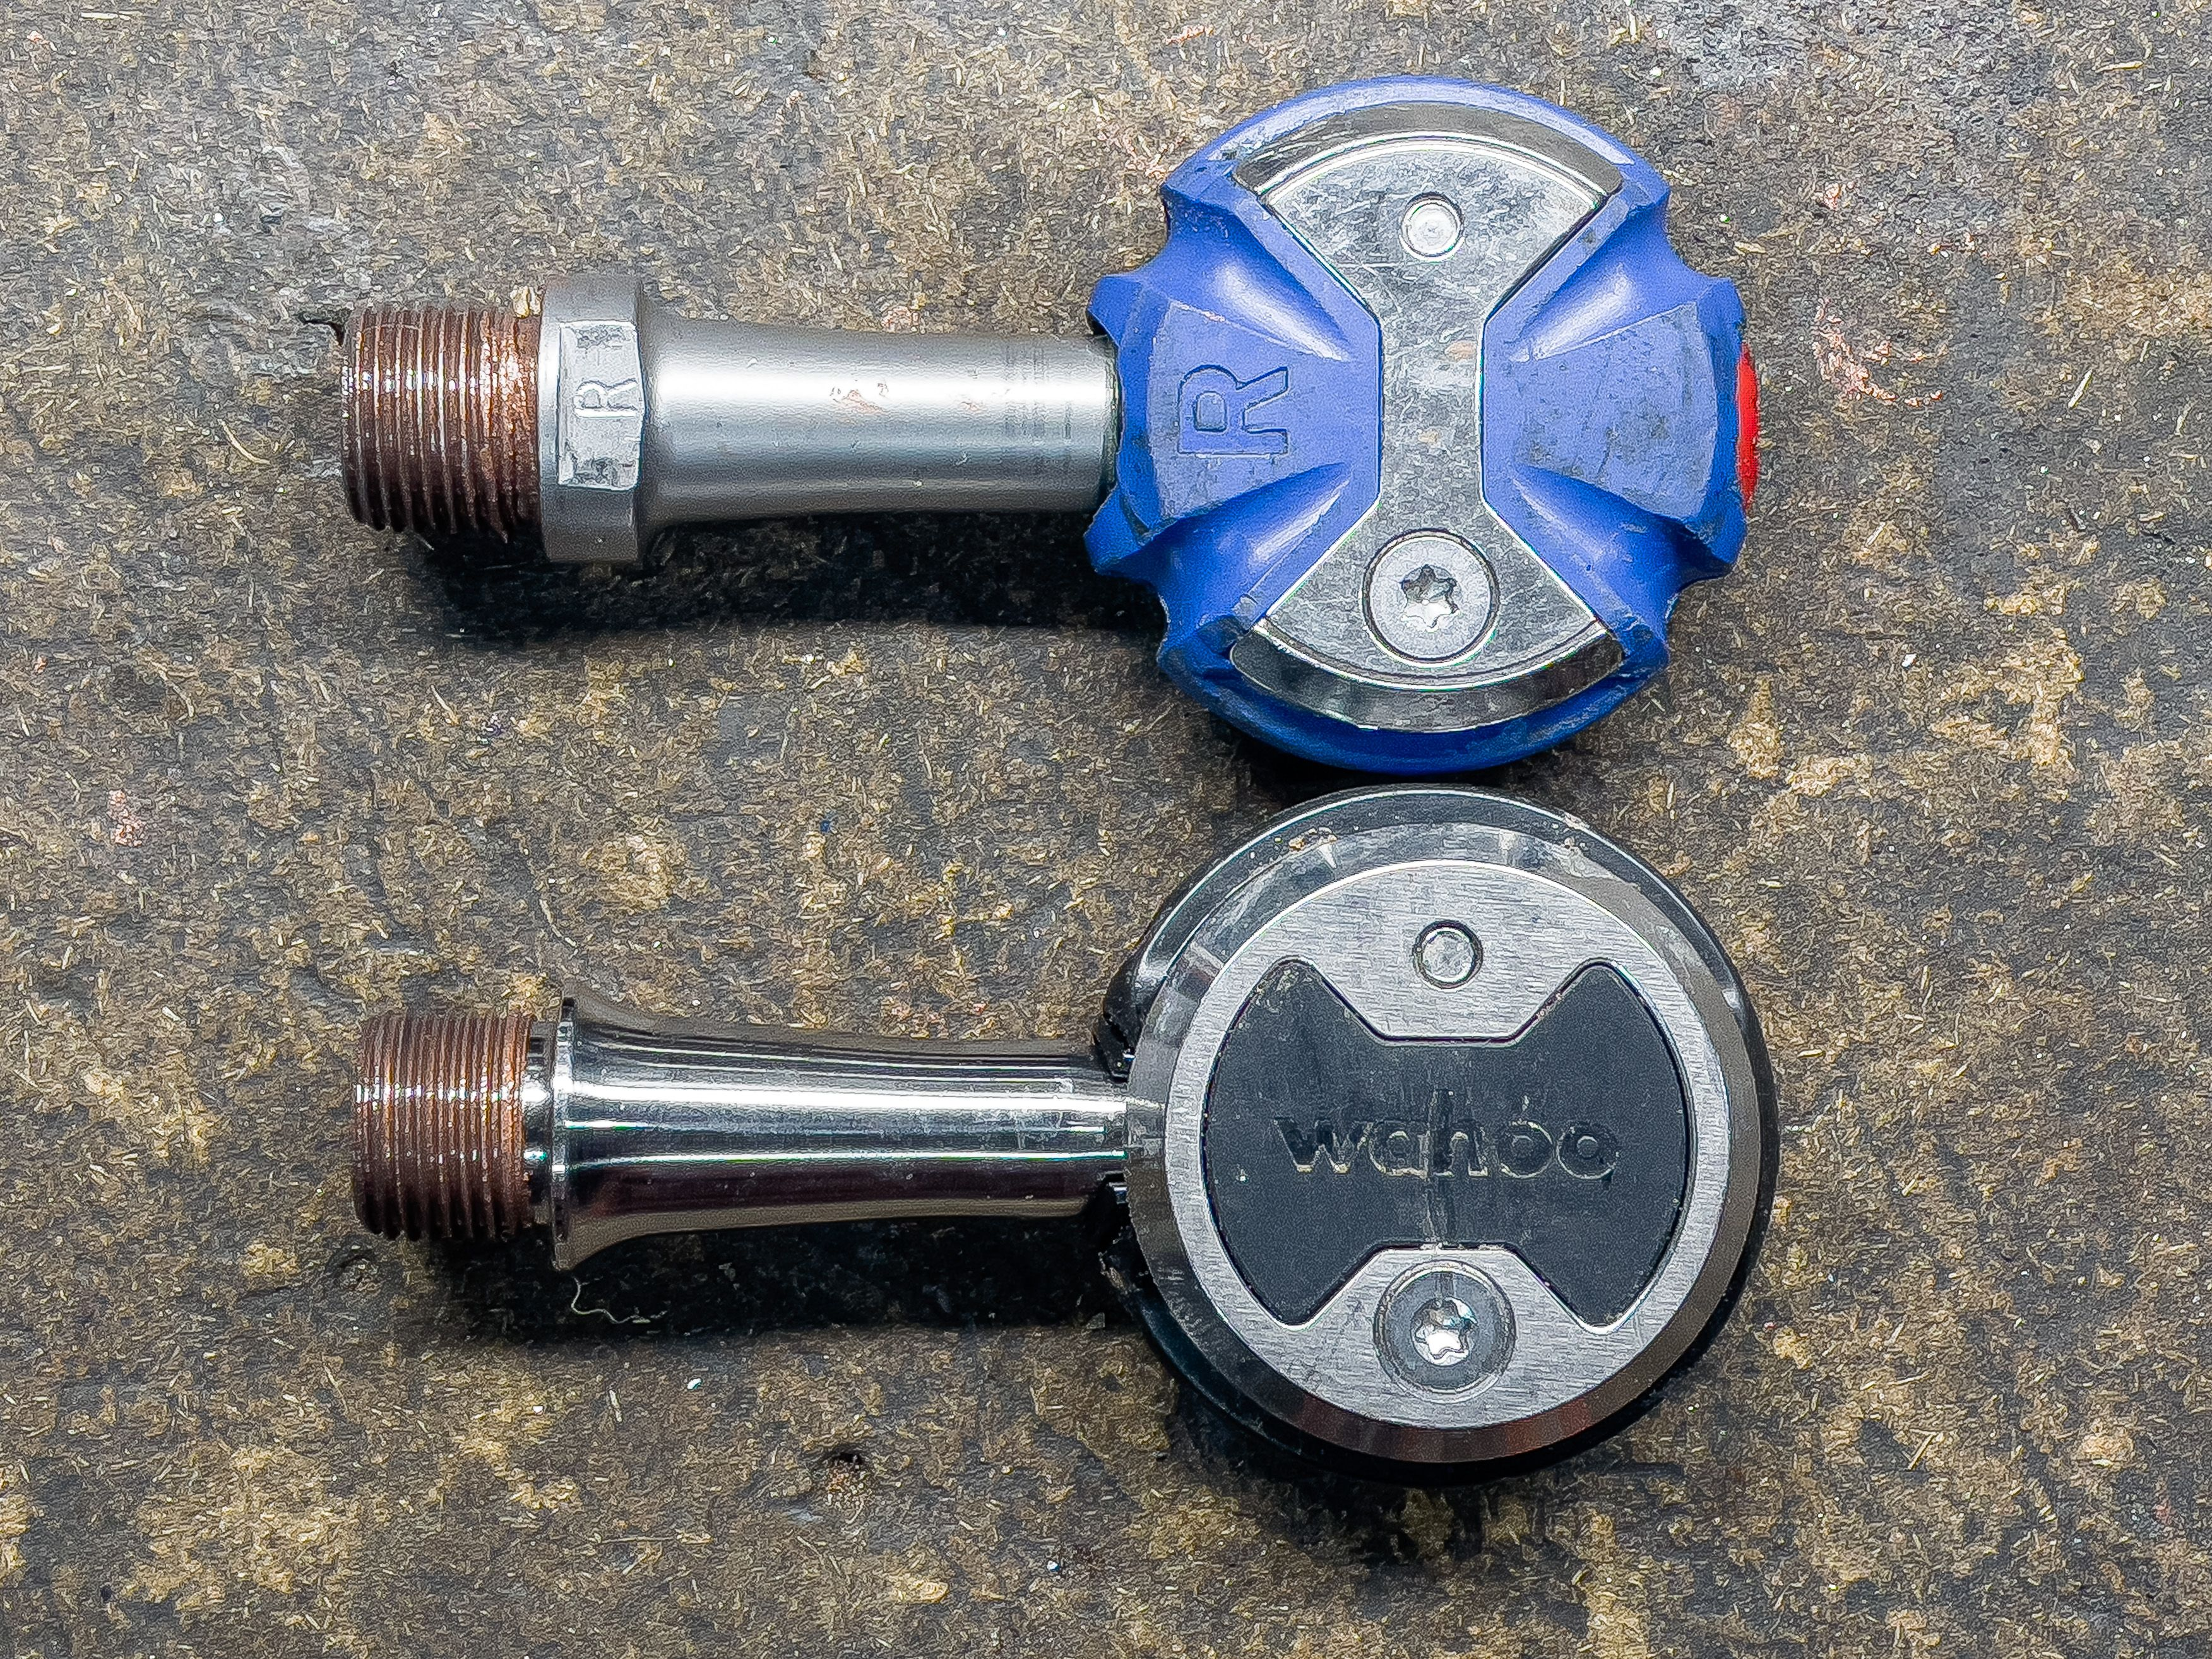 Old Speedplay pedal (top) vs new Wahoo Speedplay pedal (bottom).